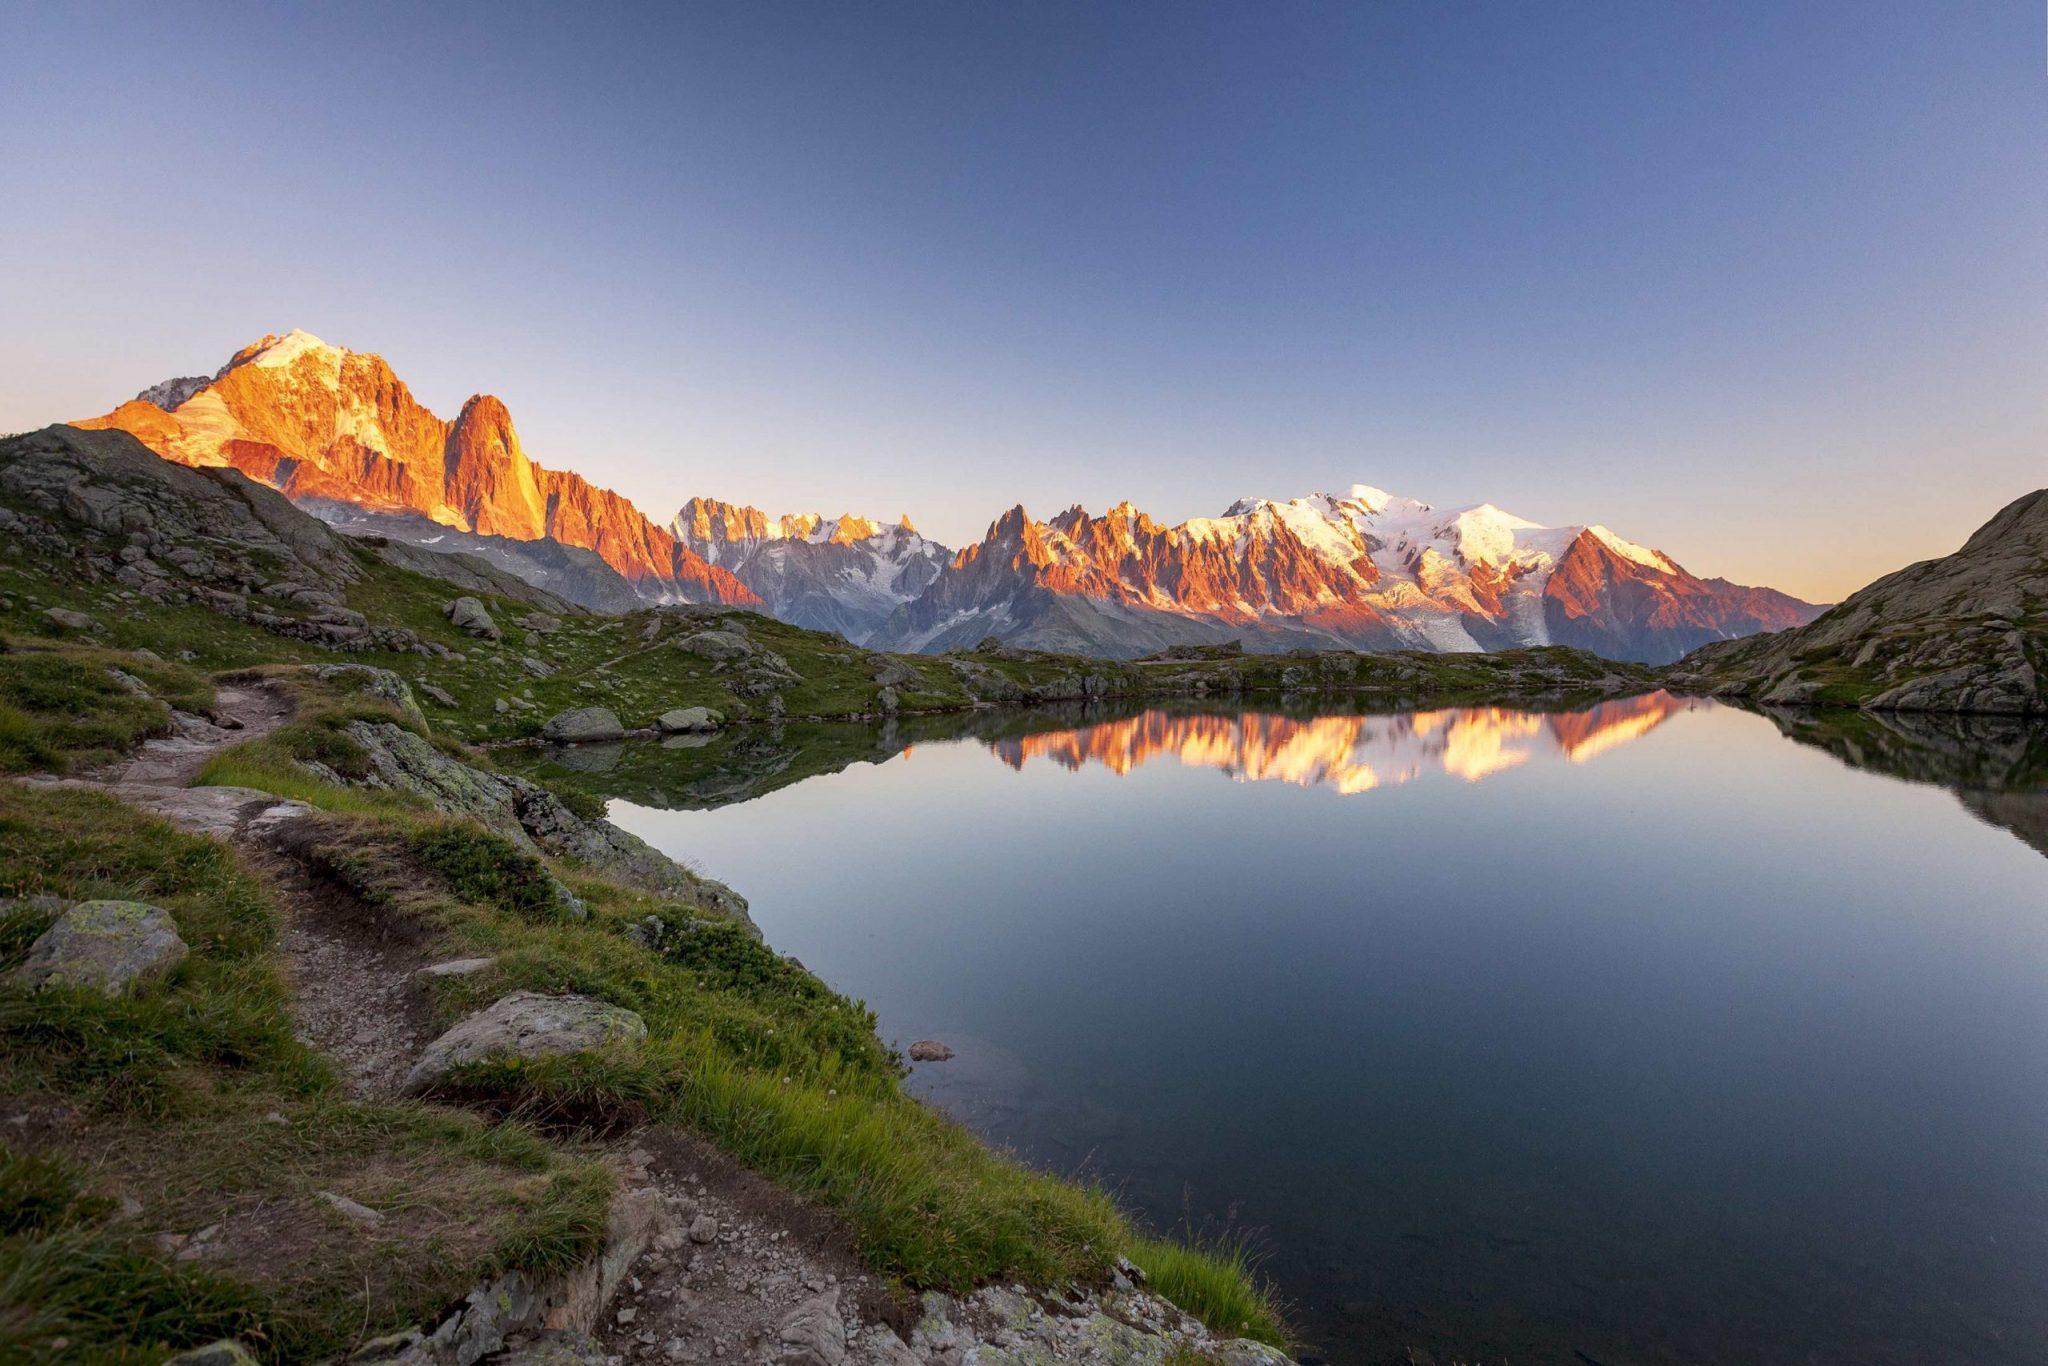 Hikers on the shore of Lac des Chéserys admiring Mont Blanc massif, Chamonix, Haute Savoie, France